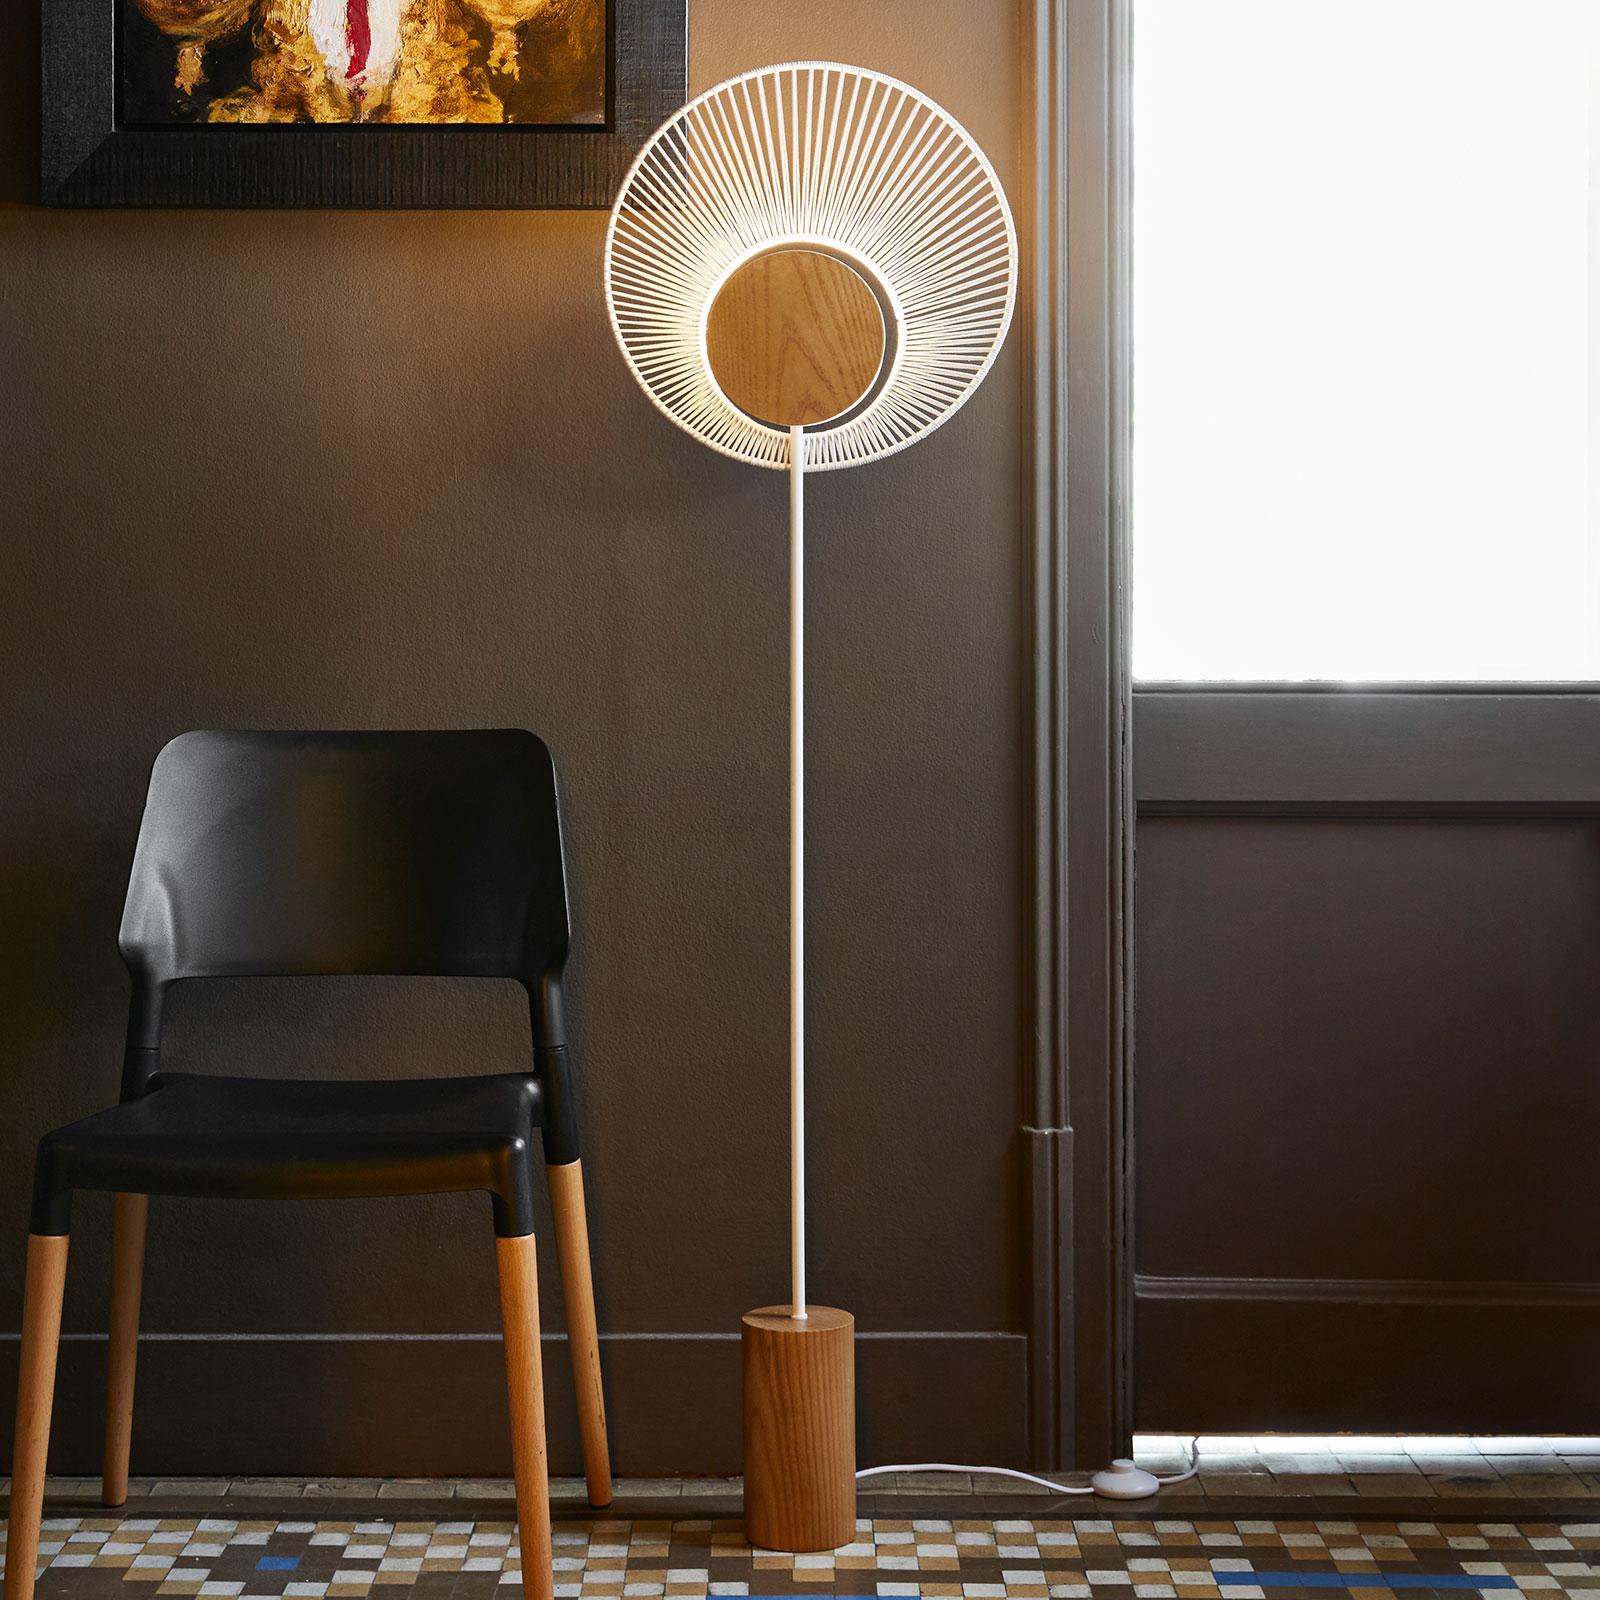 Forestier Oyster lampadaire de designer, blanc